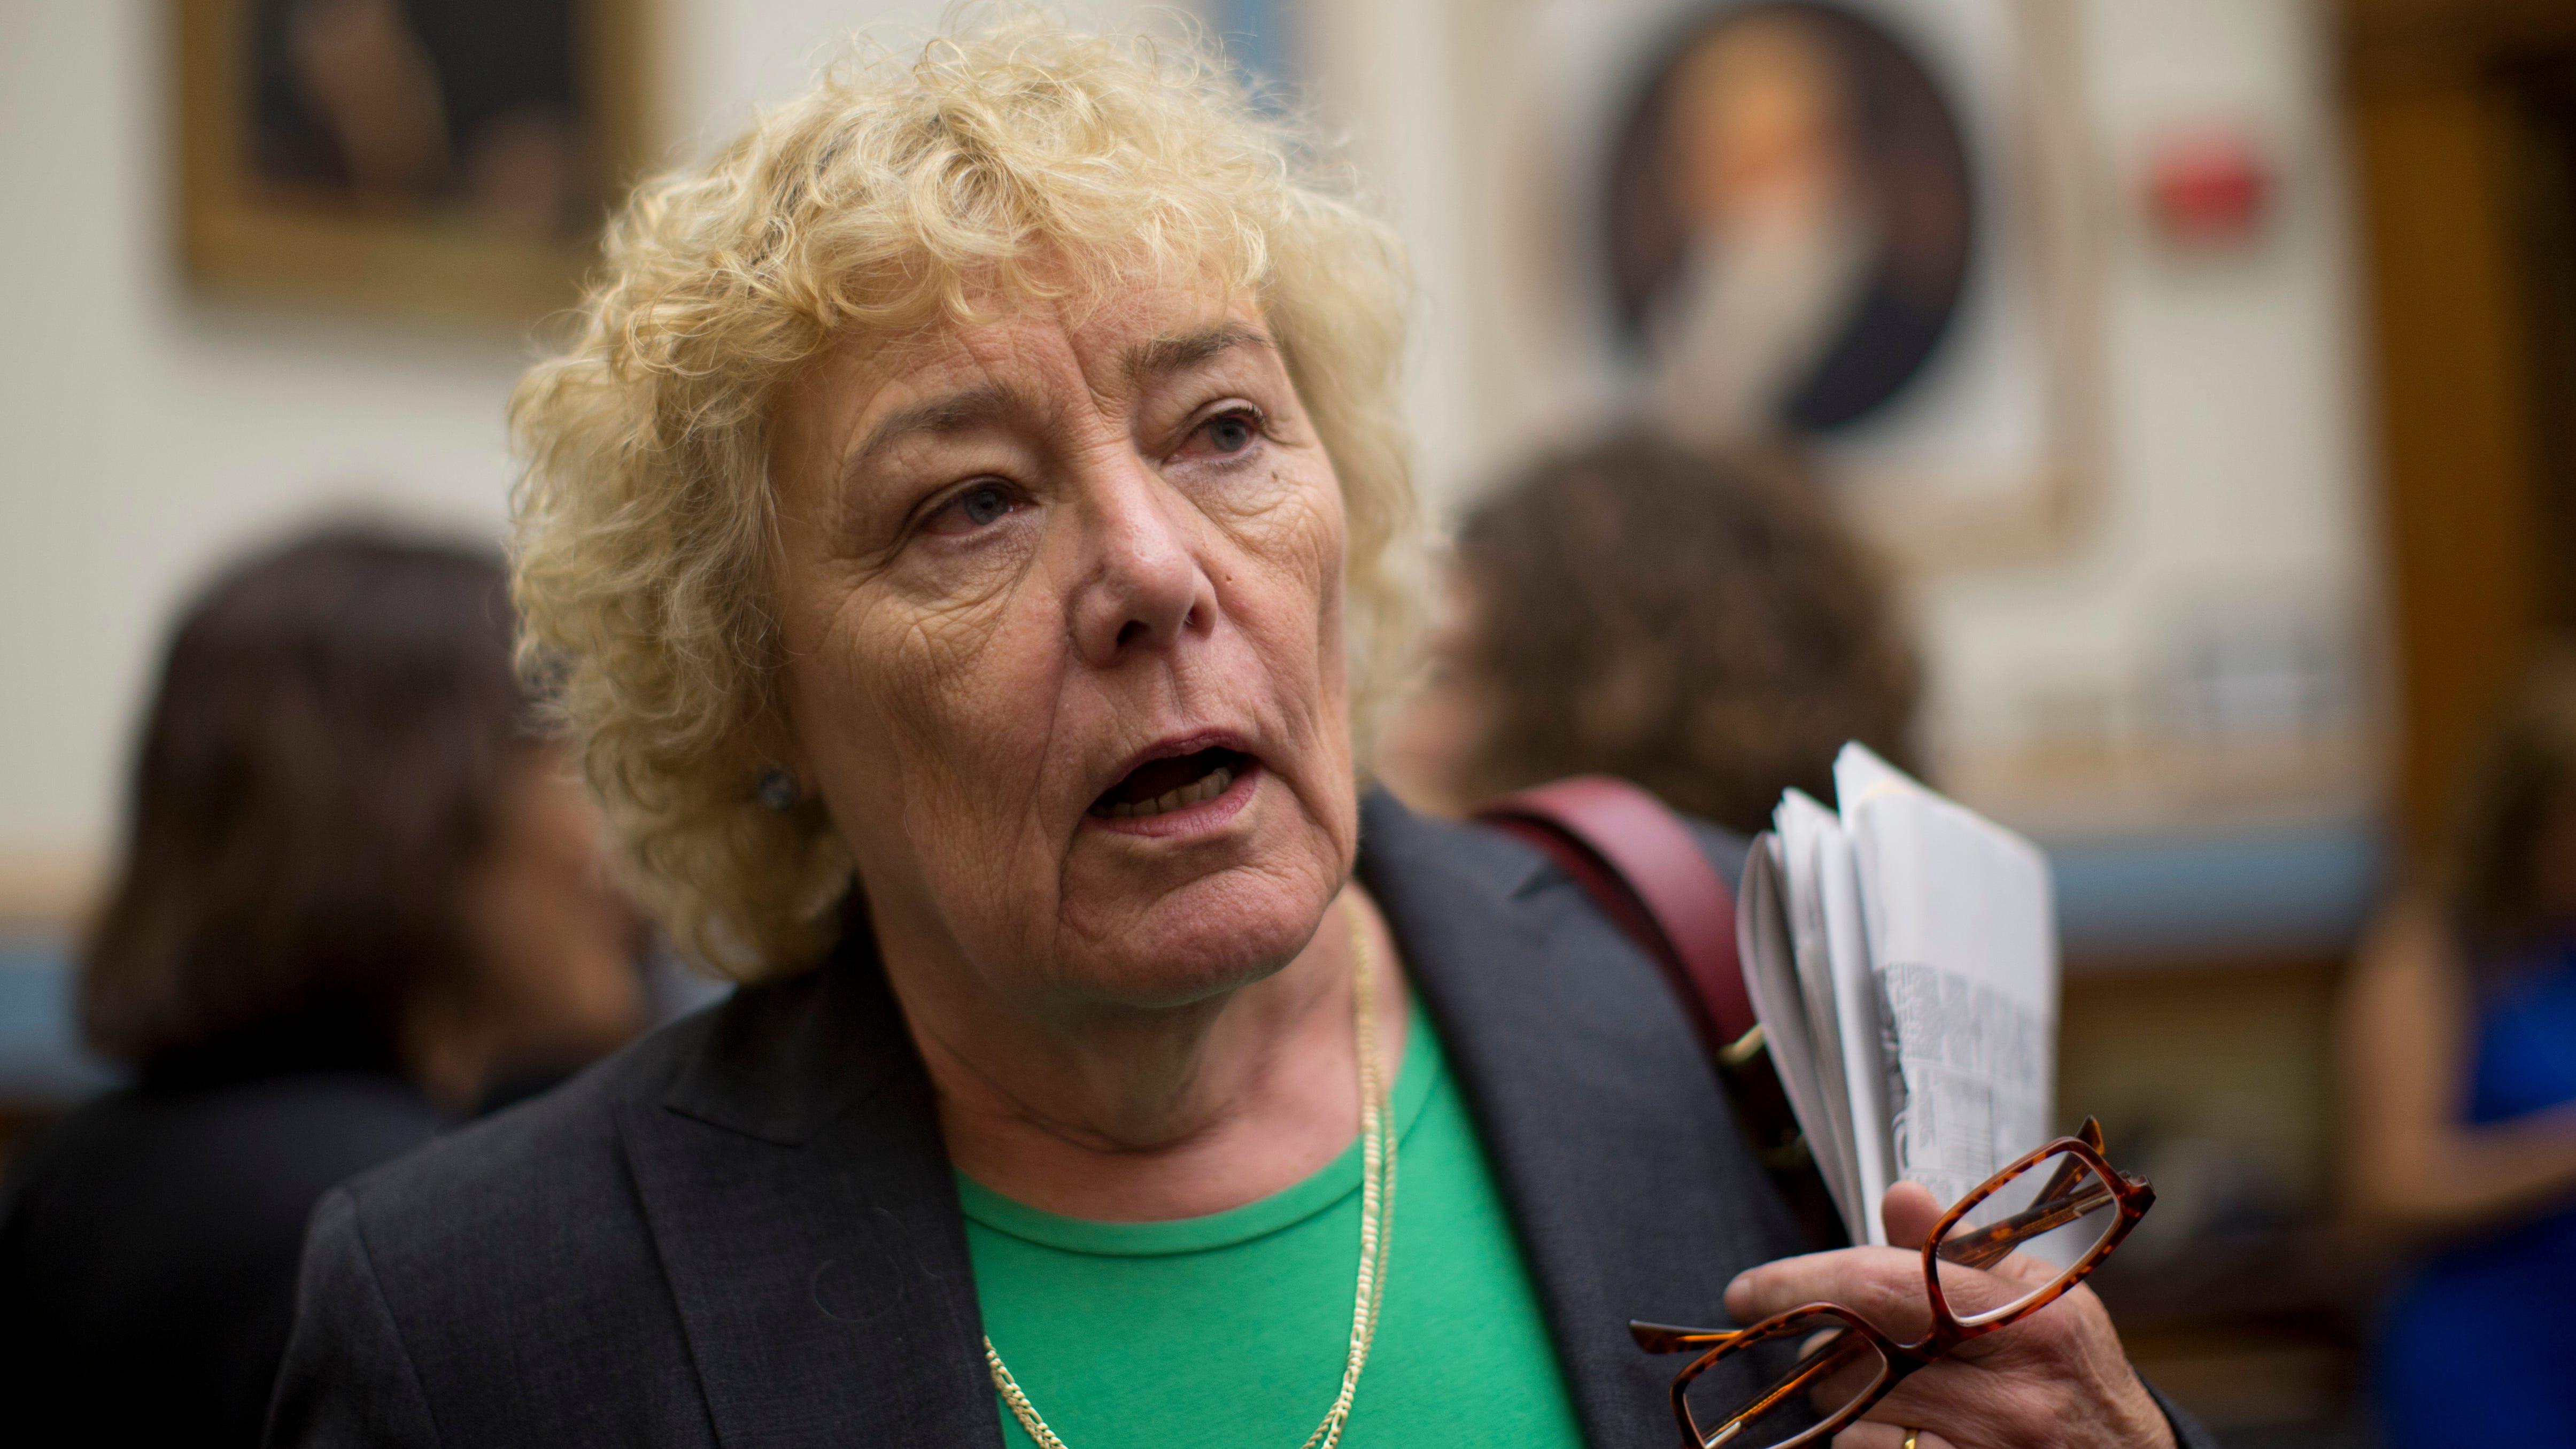 Rep. Zoe Lofgren, D-Calif., talks to media on Capitol Hill in Washington, June 18, 2013.